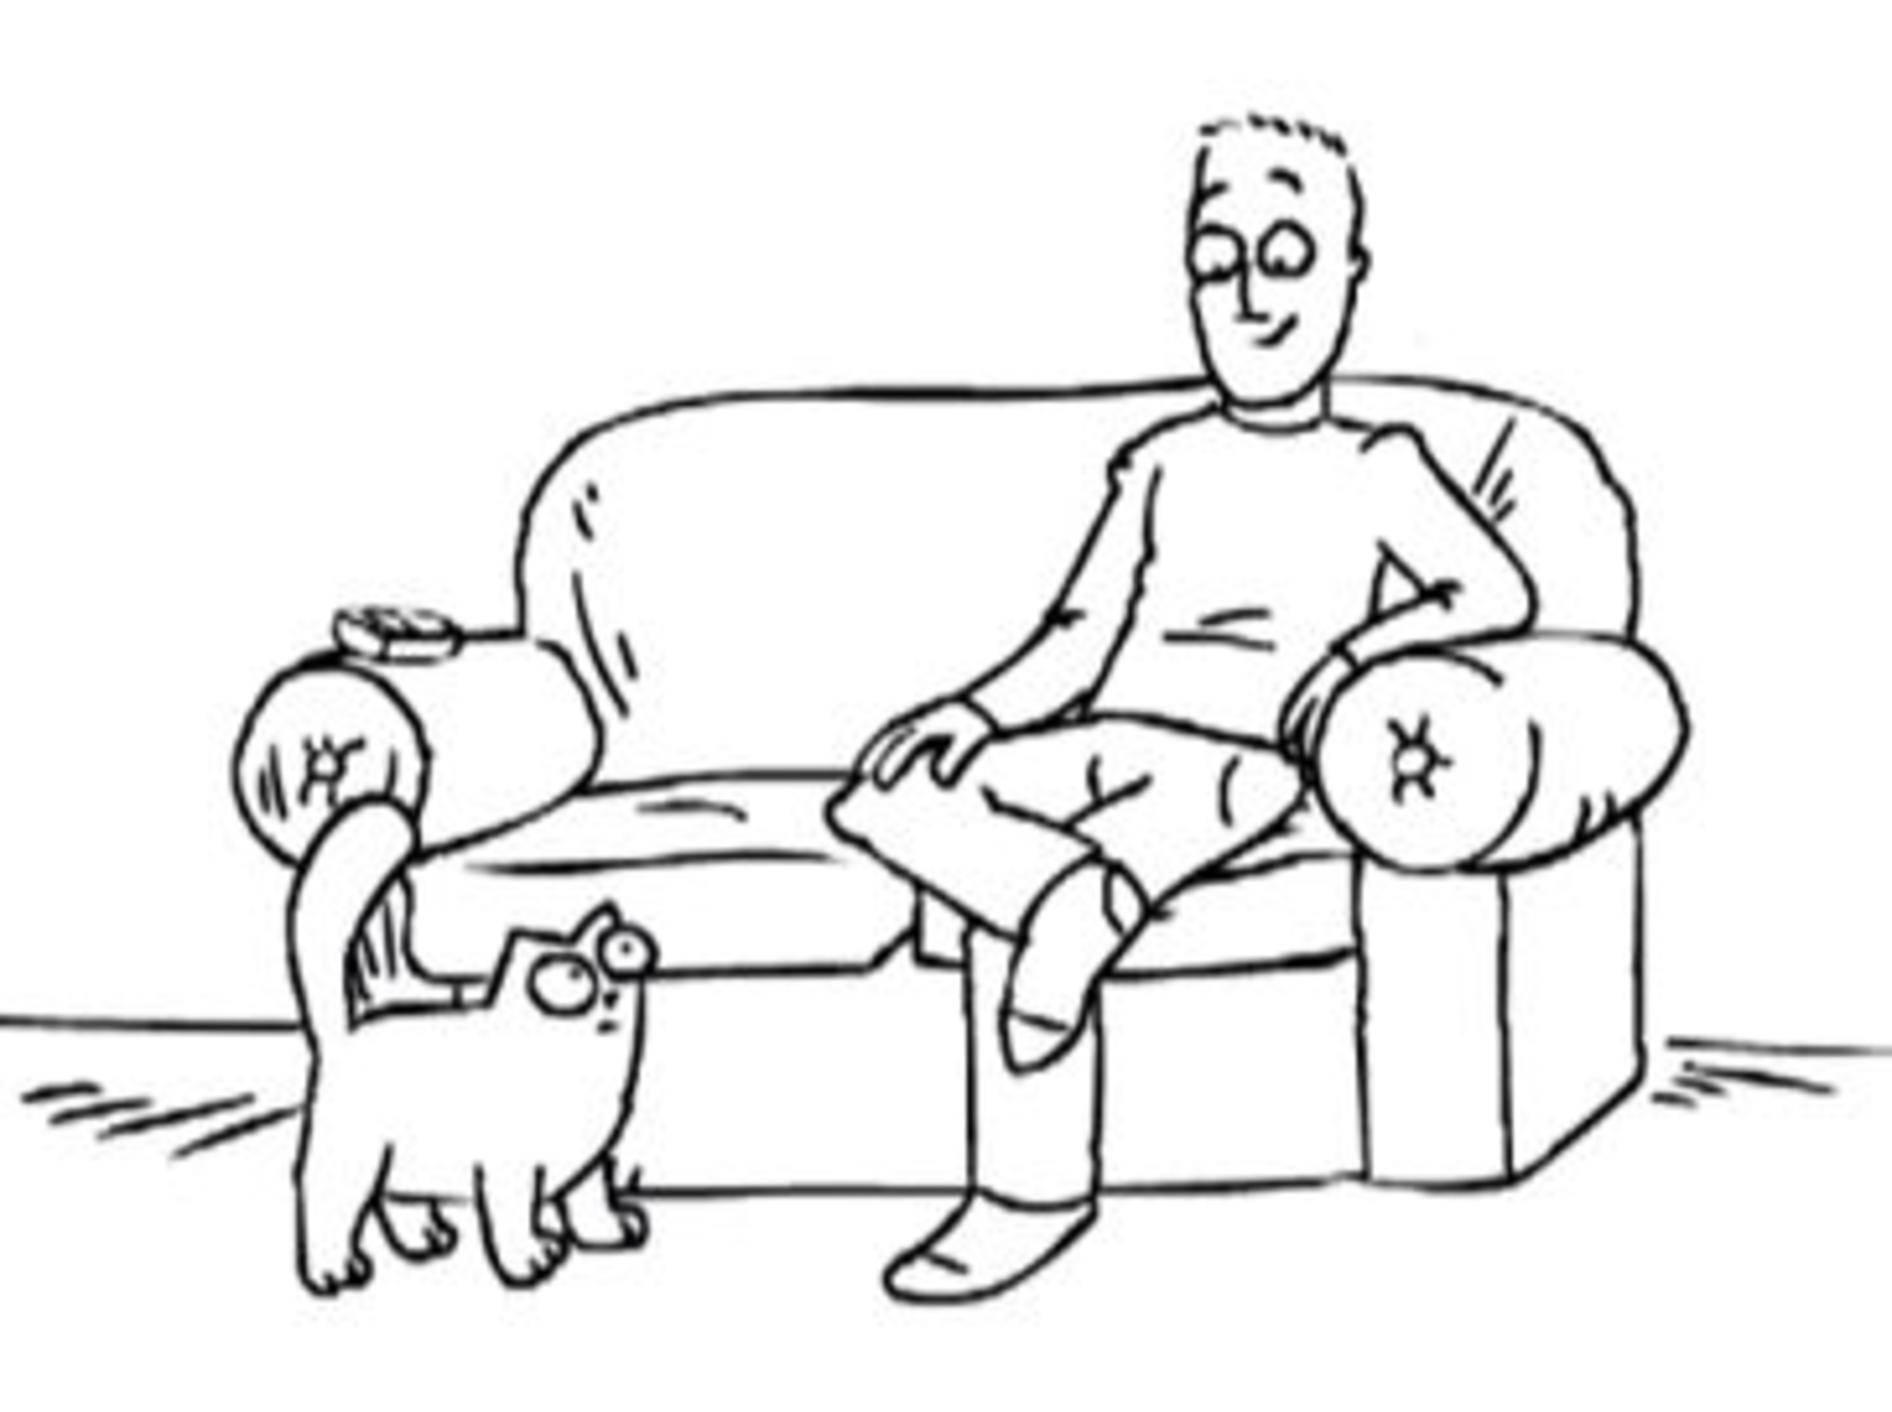 Lustiger Comicheld: Wer ist eigentlich Simon's Cat? — Bild: Youtube / simonscat